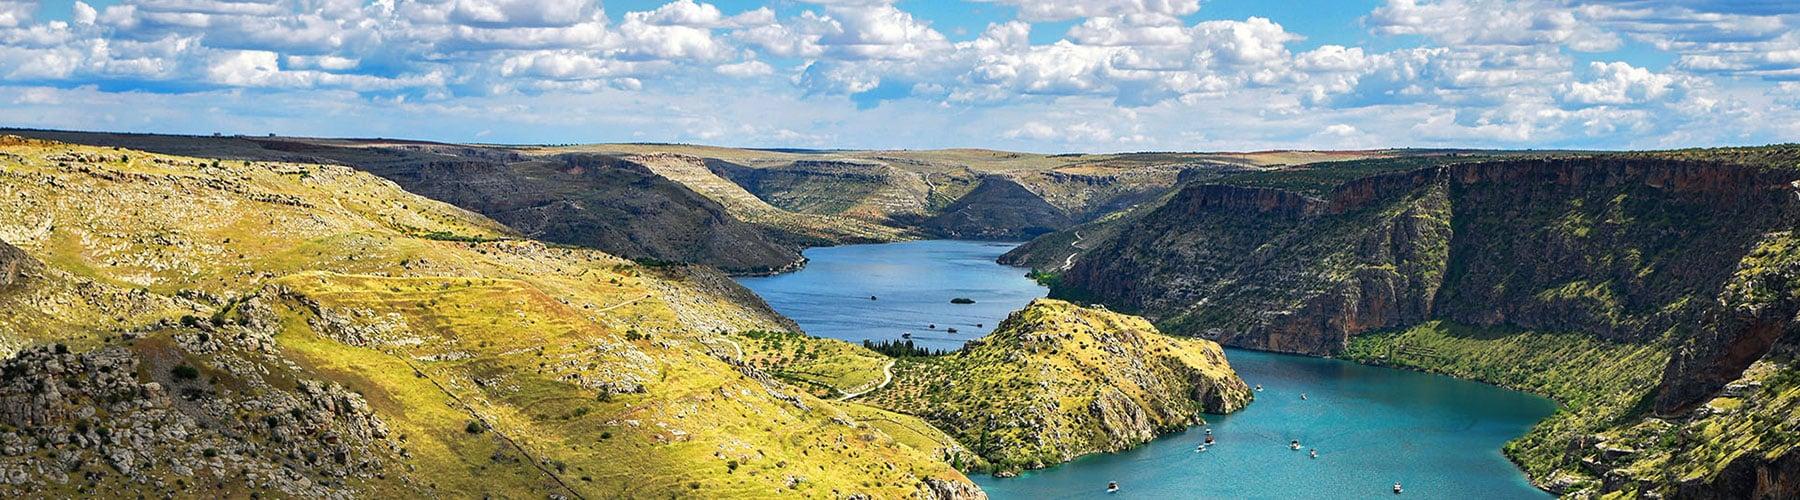 Southeastern Anatolia Region Turkey